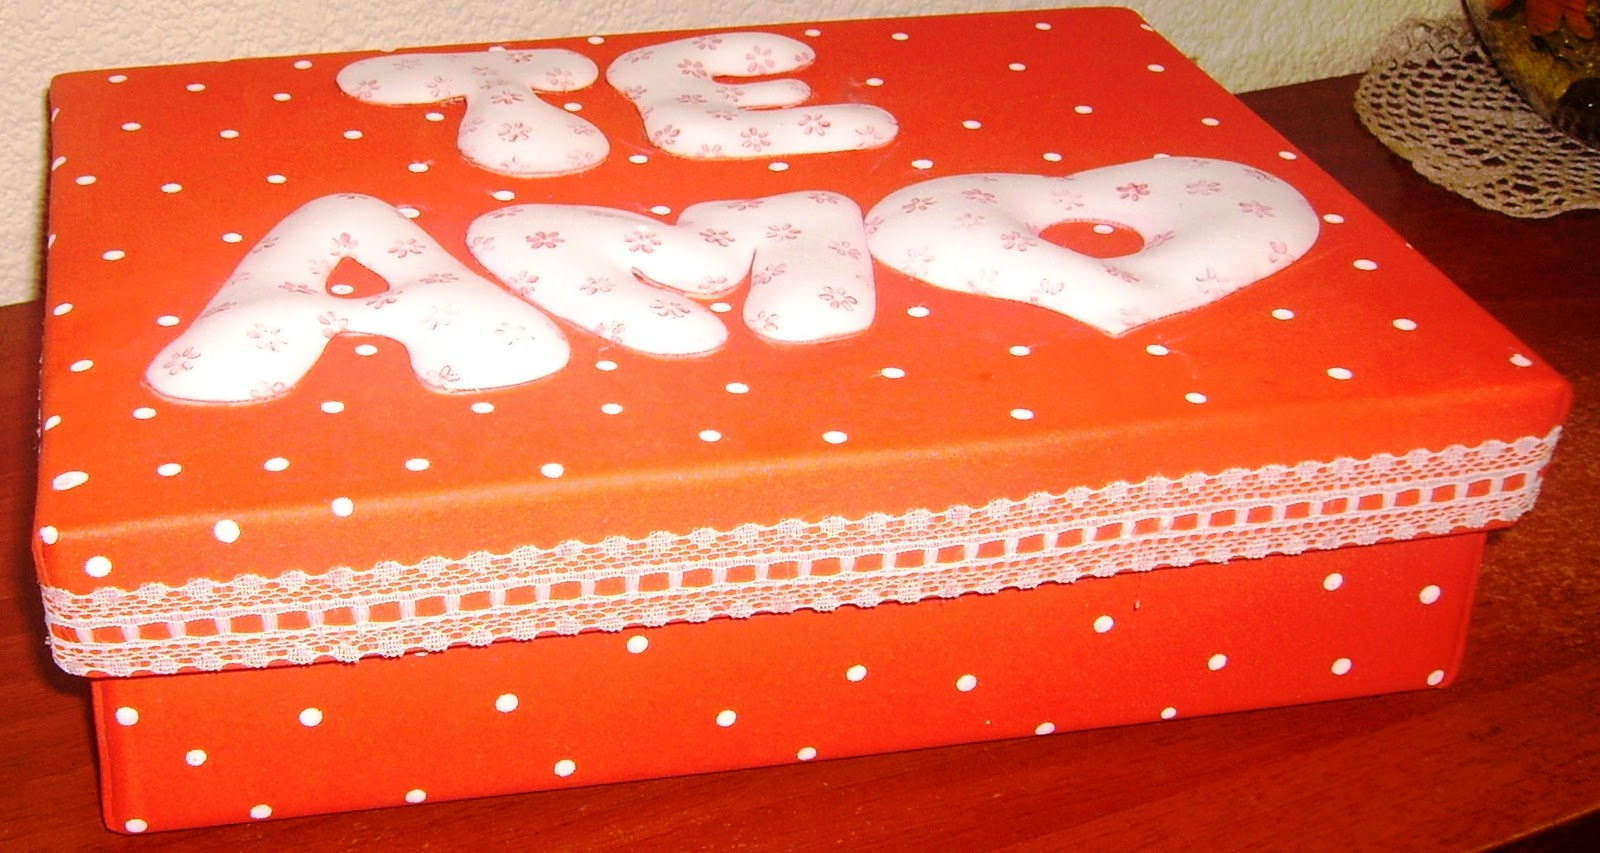 Para San Mardedi Cajas El Valentin Dia De SSqF5